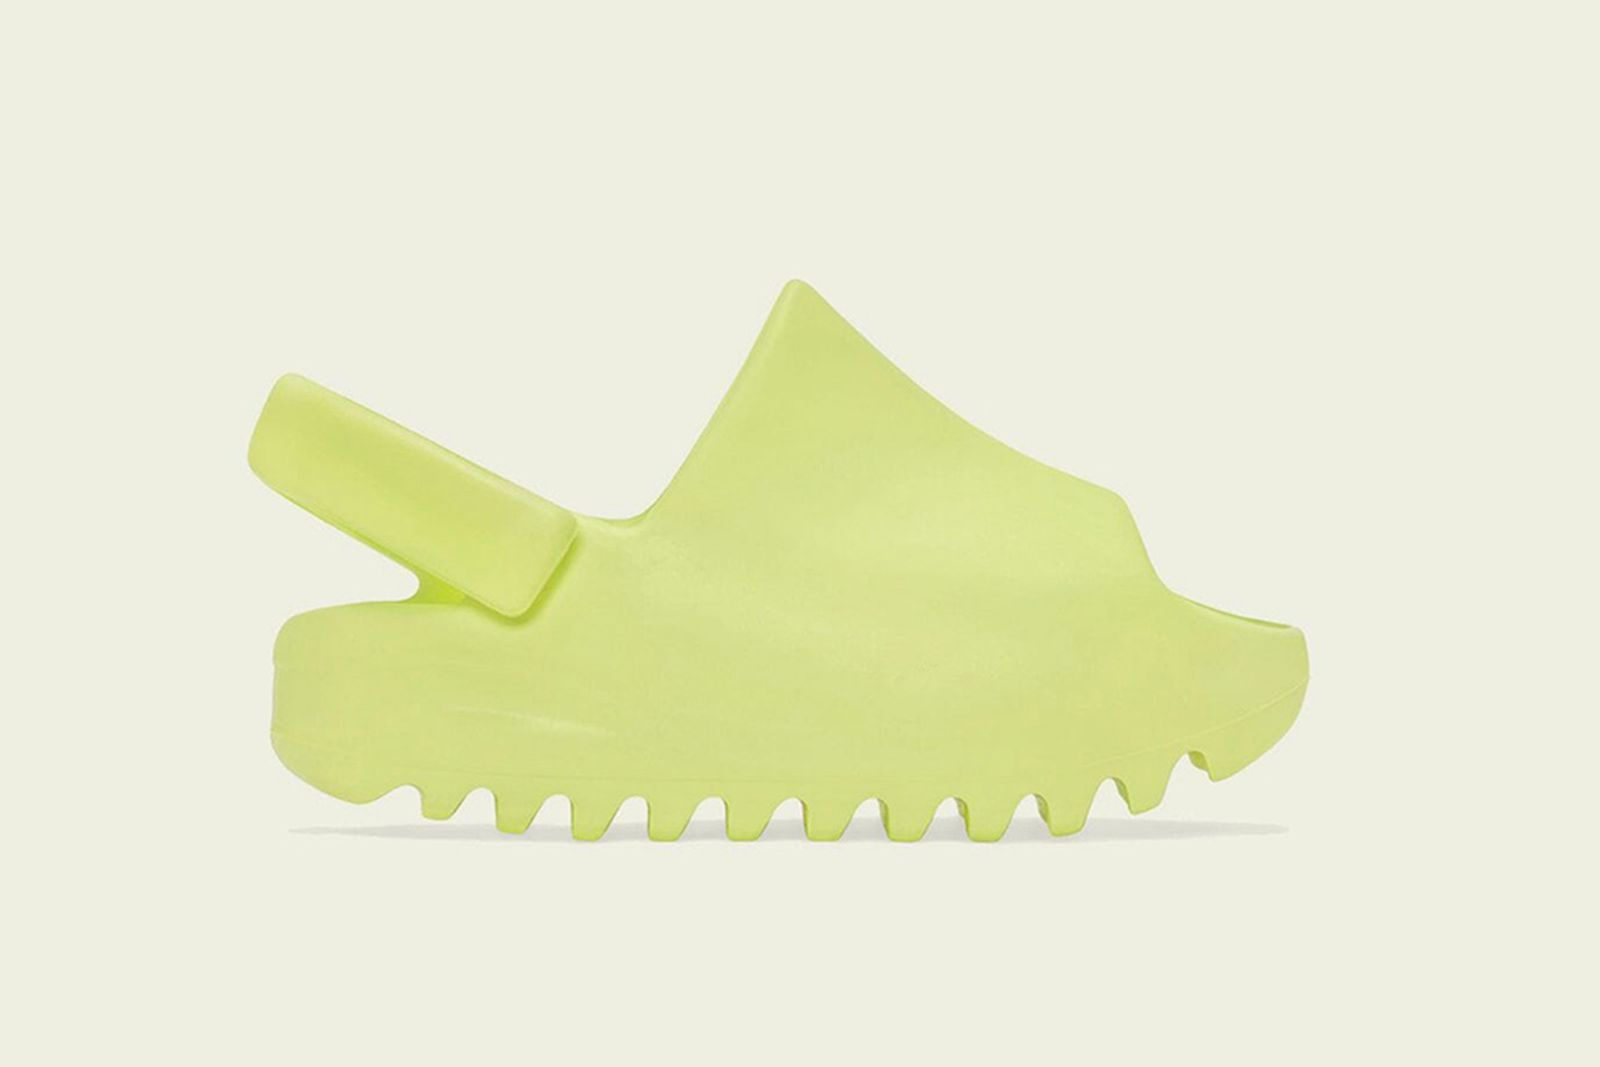 adidas-yeezy-slide-green-glow-release-date-info-price-09